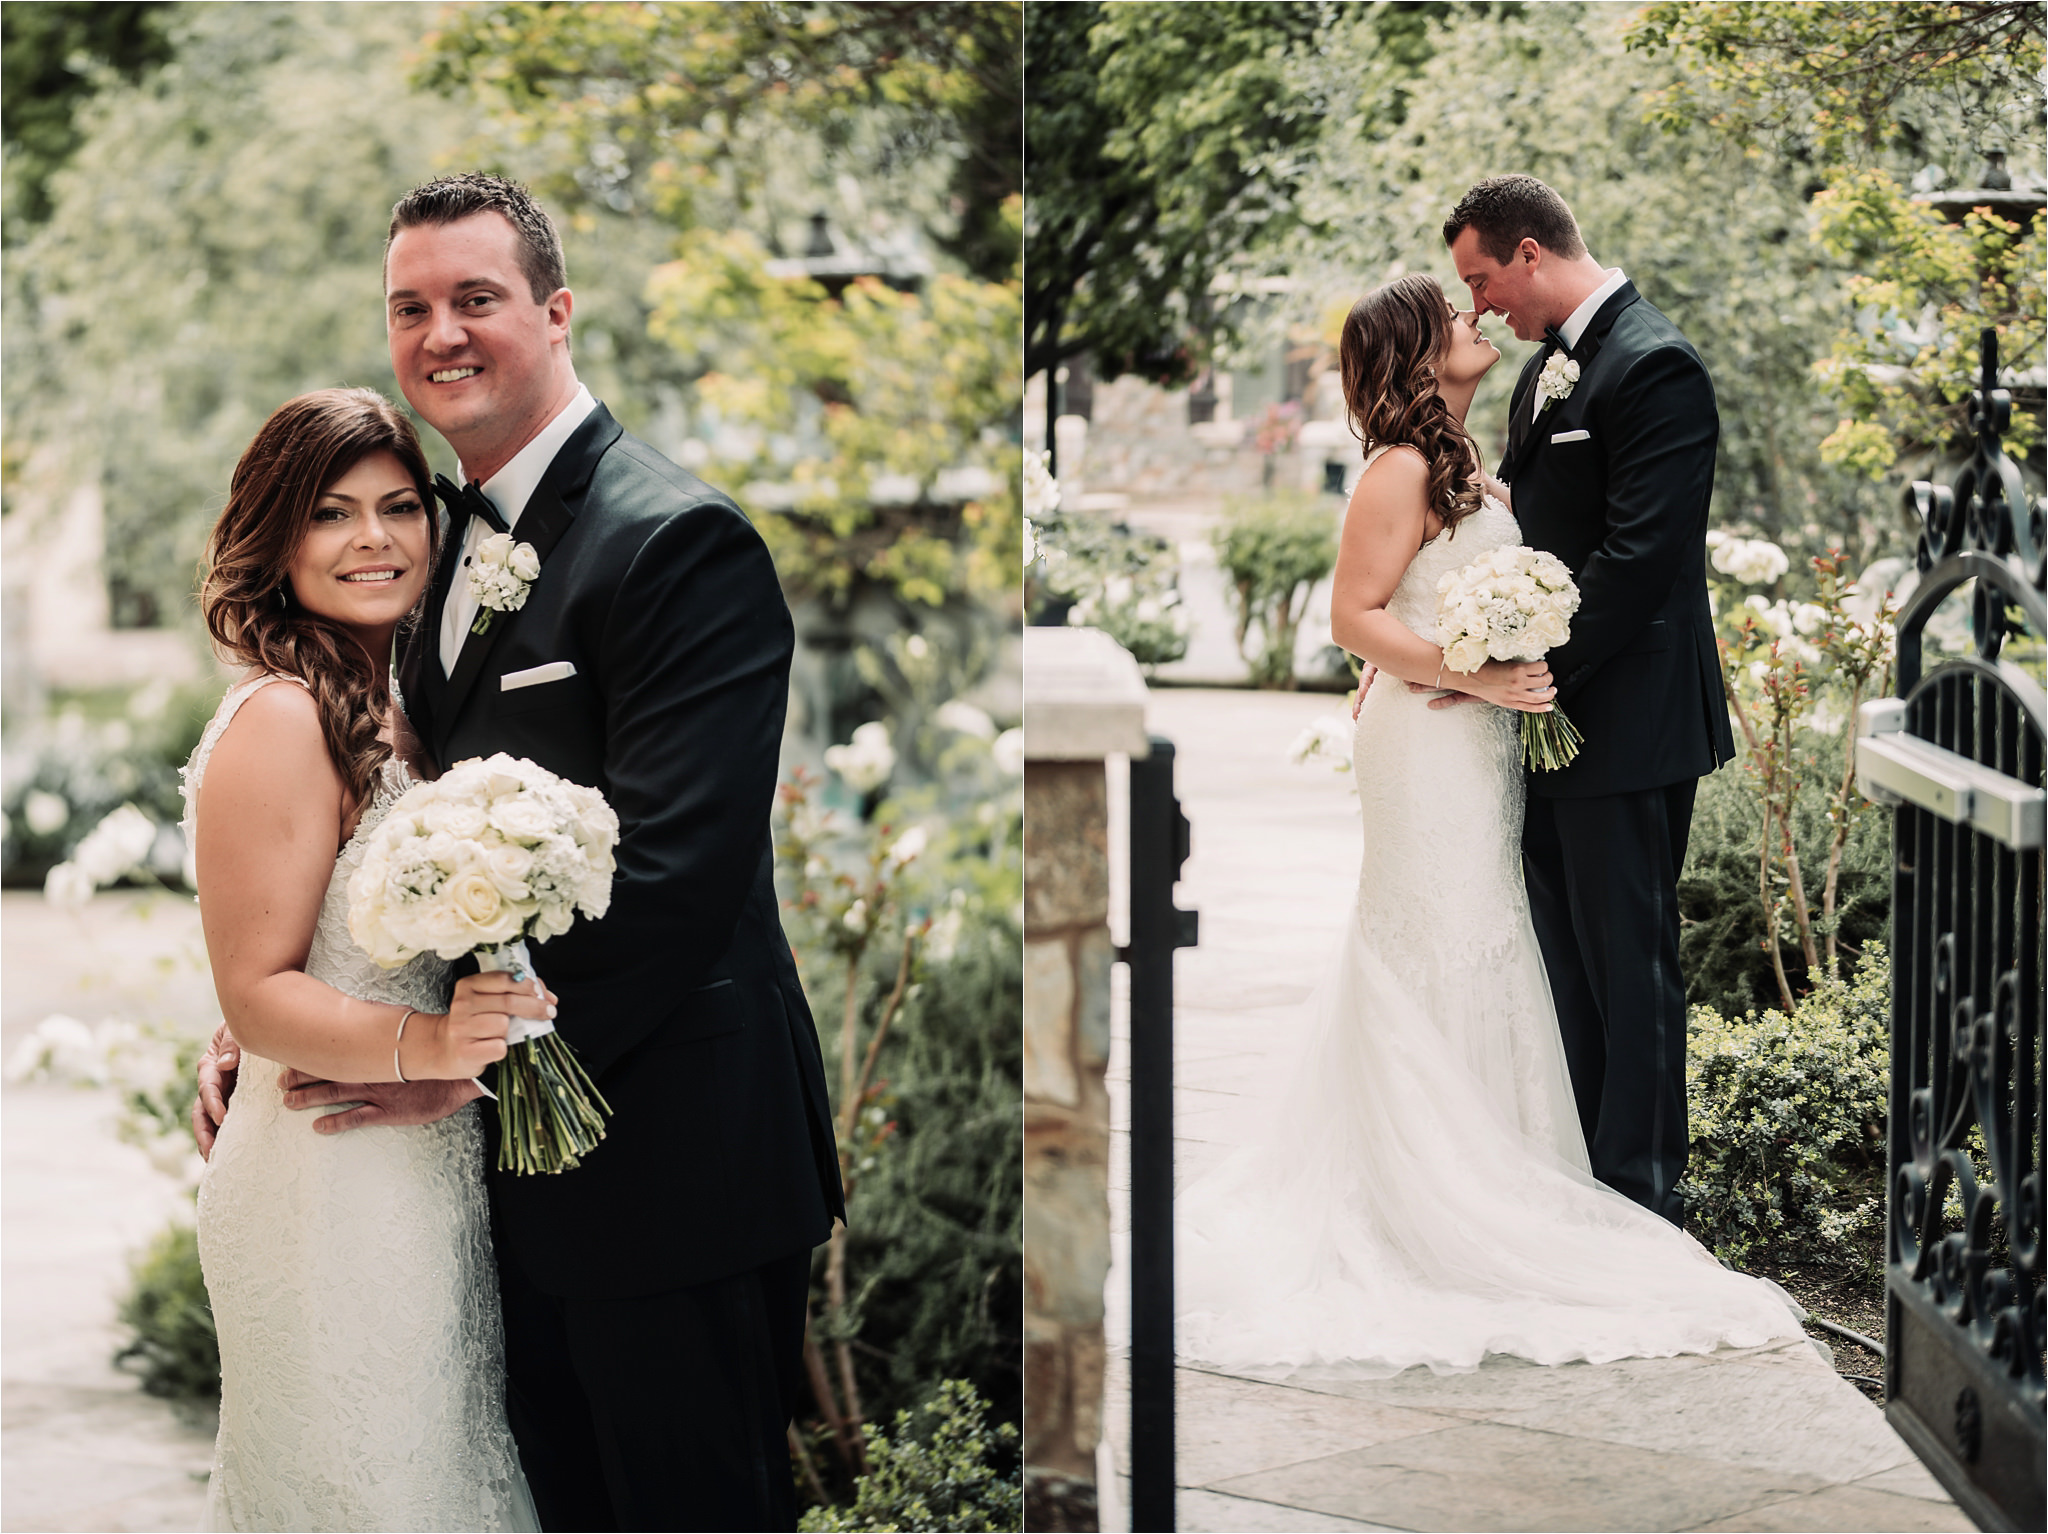 jessica-roman-photography-arden hills wedding photograpger-sacramento-boise-13.jpg